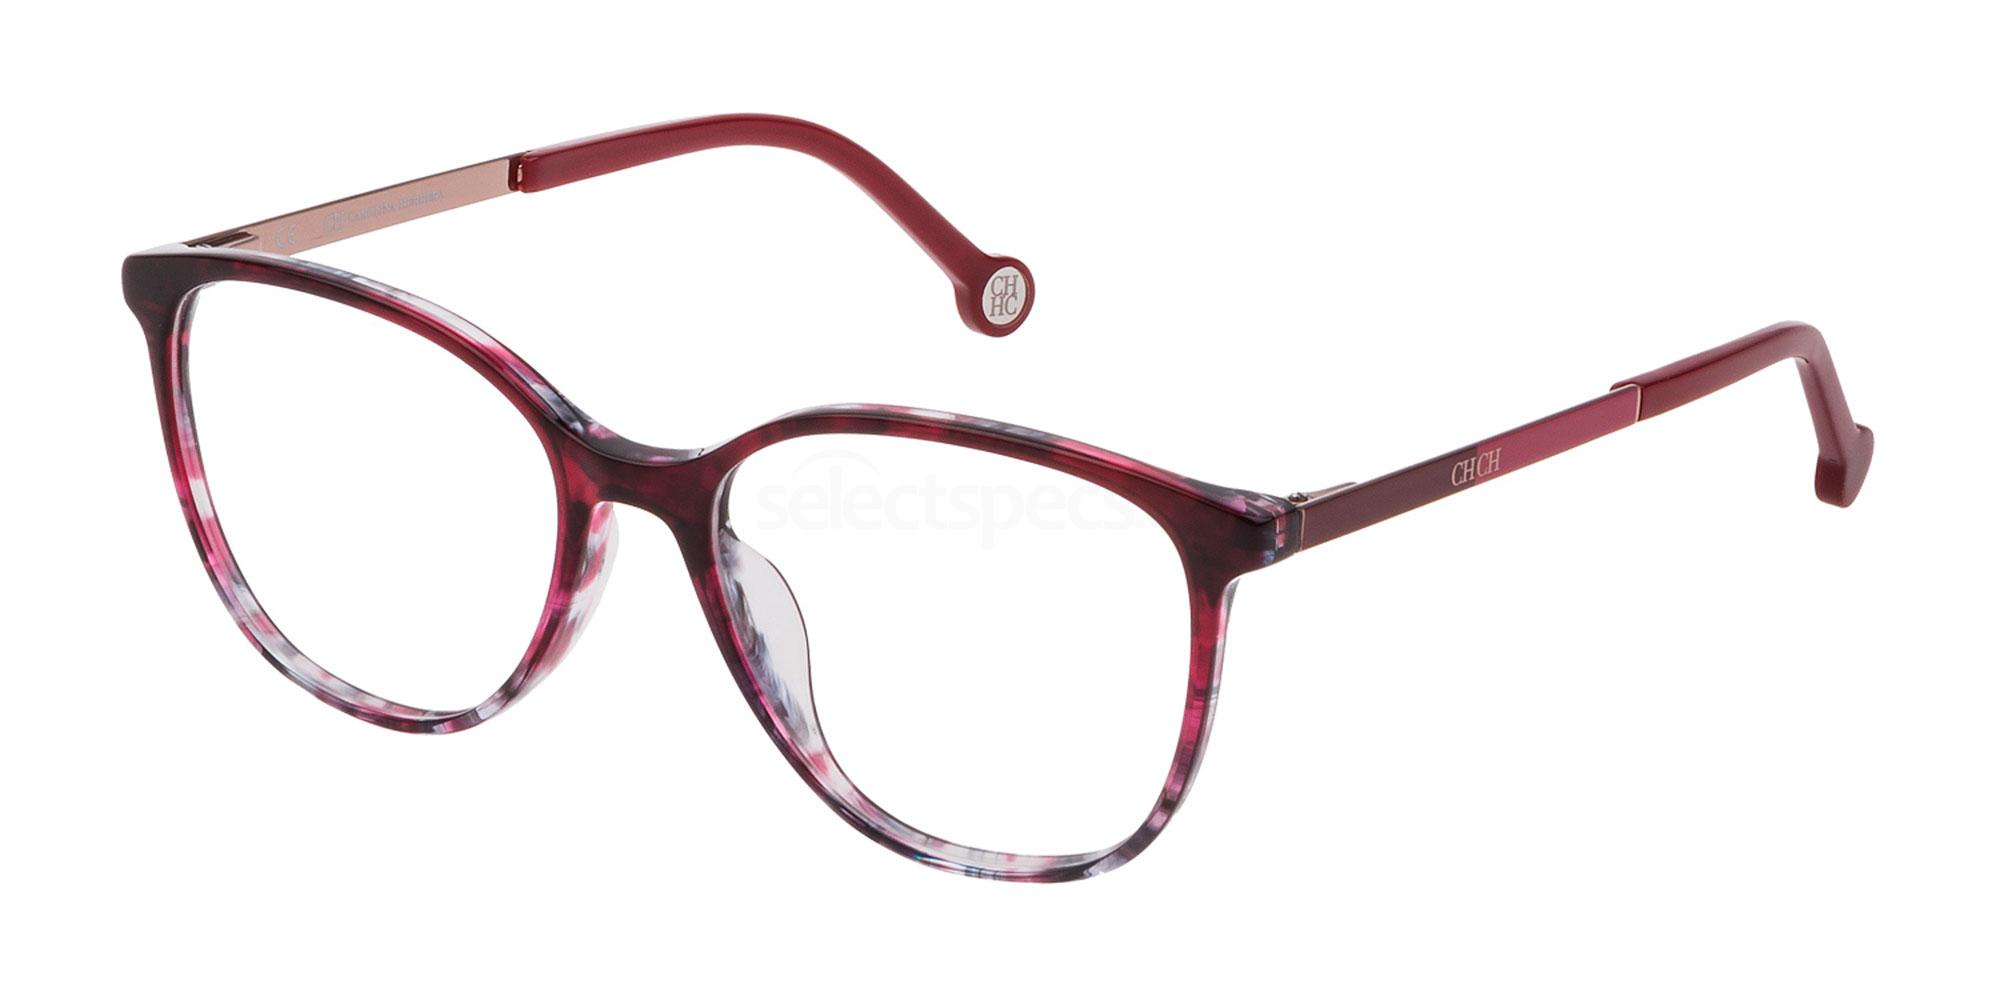 02AS VHE819 Glasses, CH Carolina Herrera